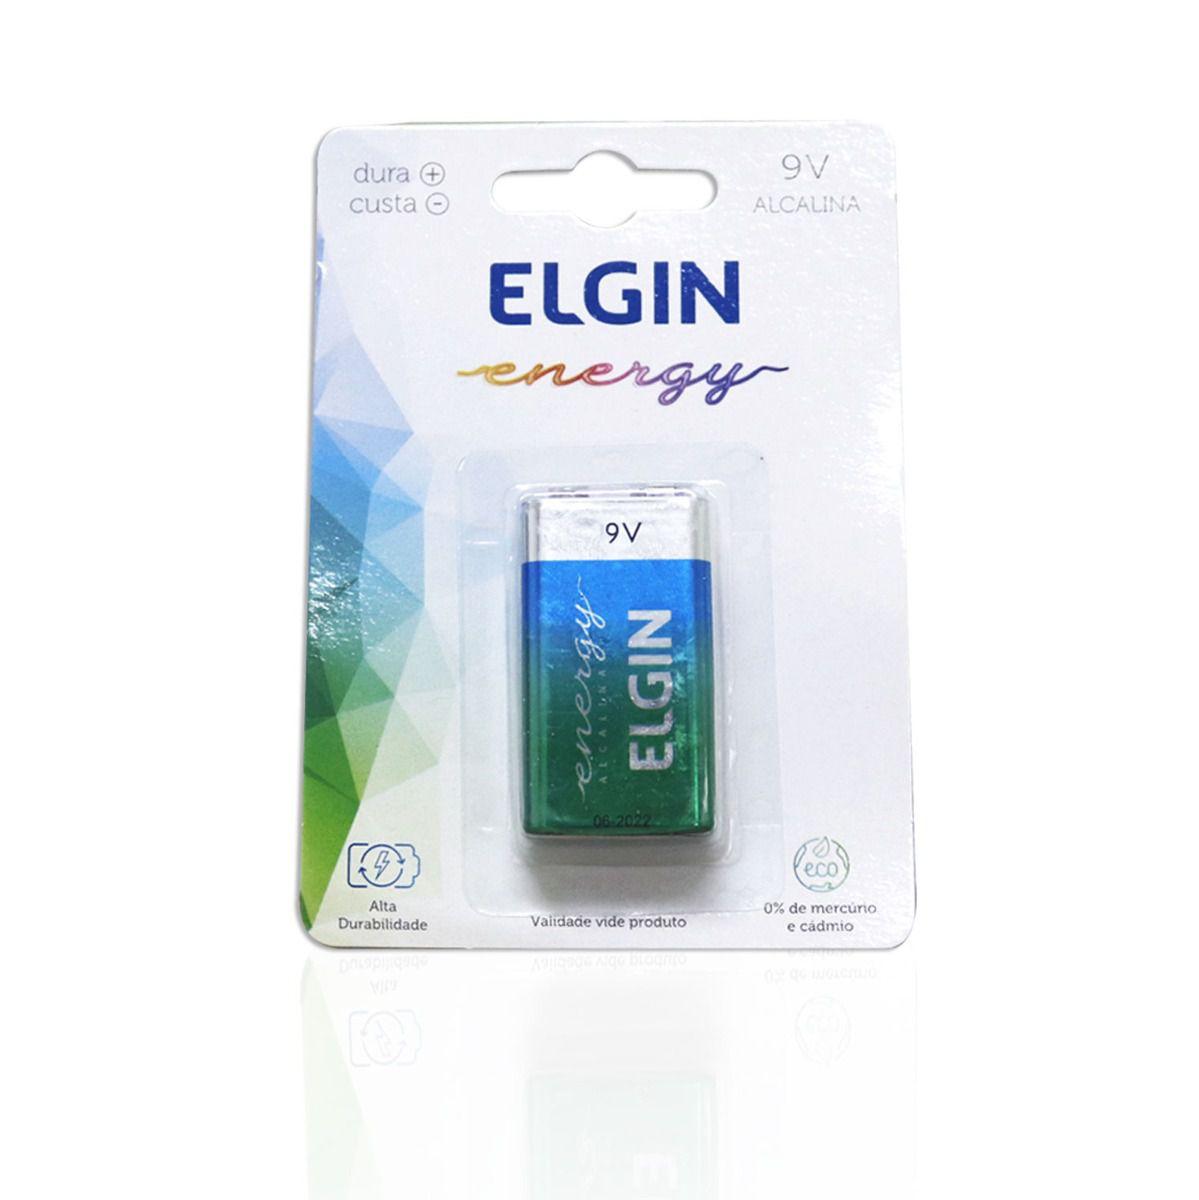 BATERIA 9V ELGIN ALCALINA ENERGY 6LR61 9V BLISTER 1 UN.